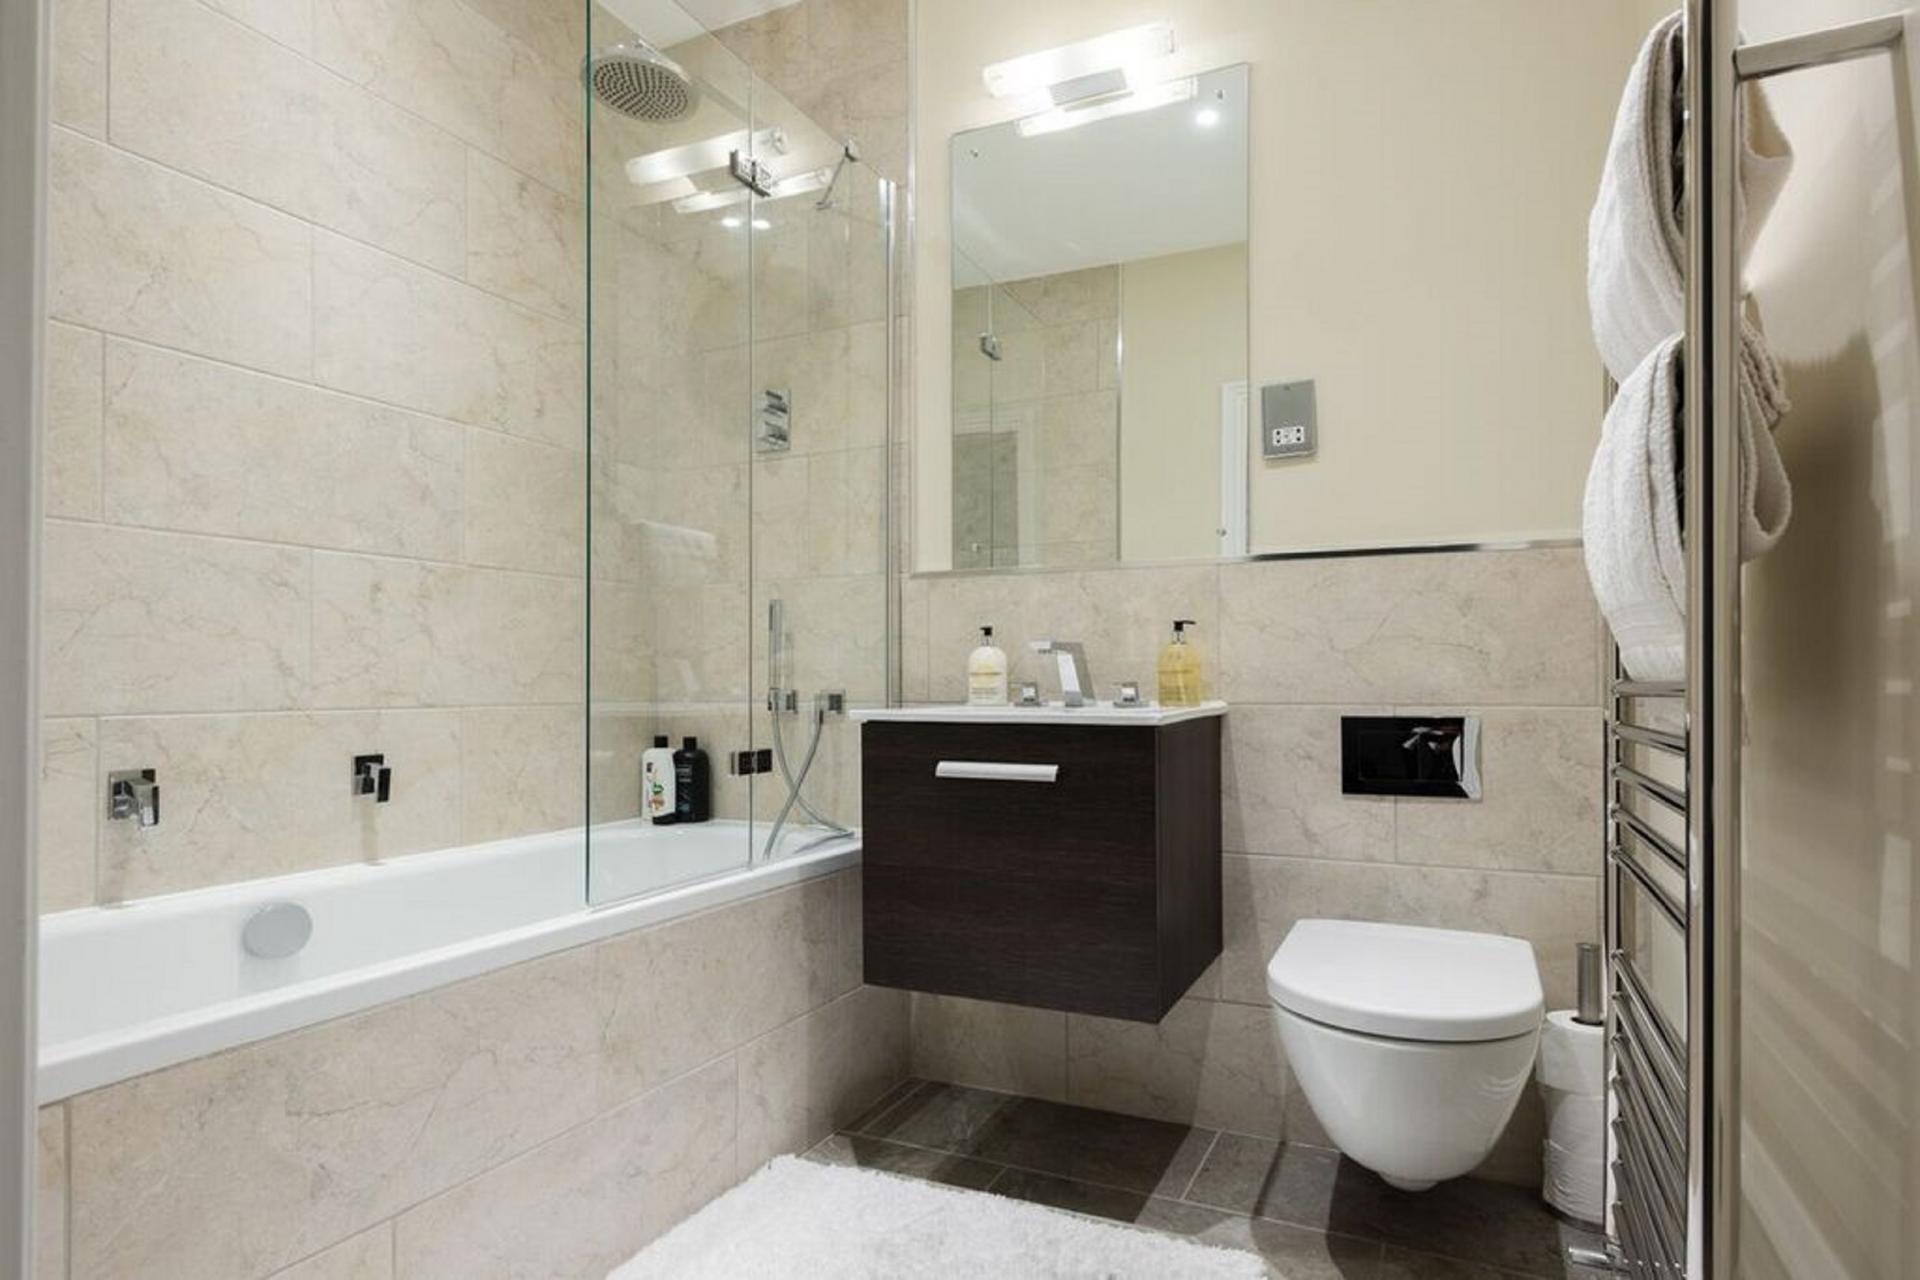 Bathroom at The Soho Studio Apartment, Paddington, London - Citybase Apartments